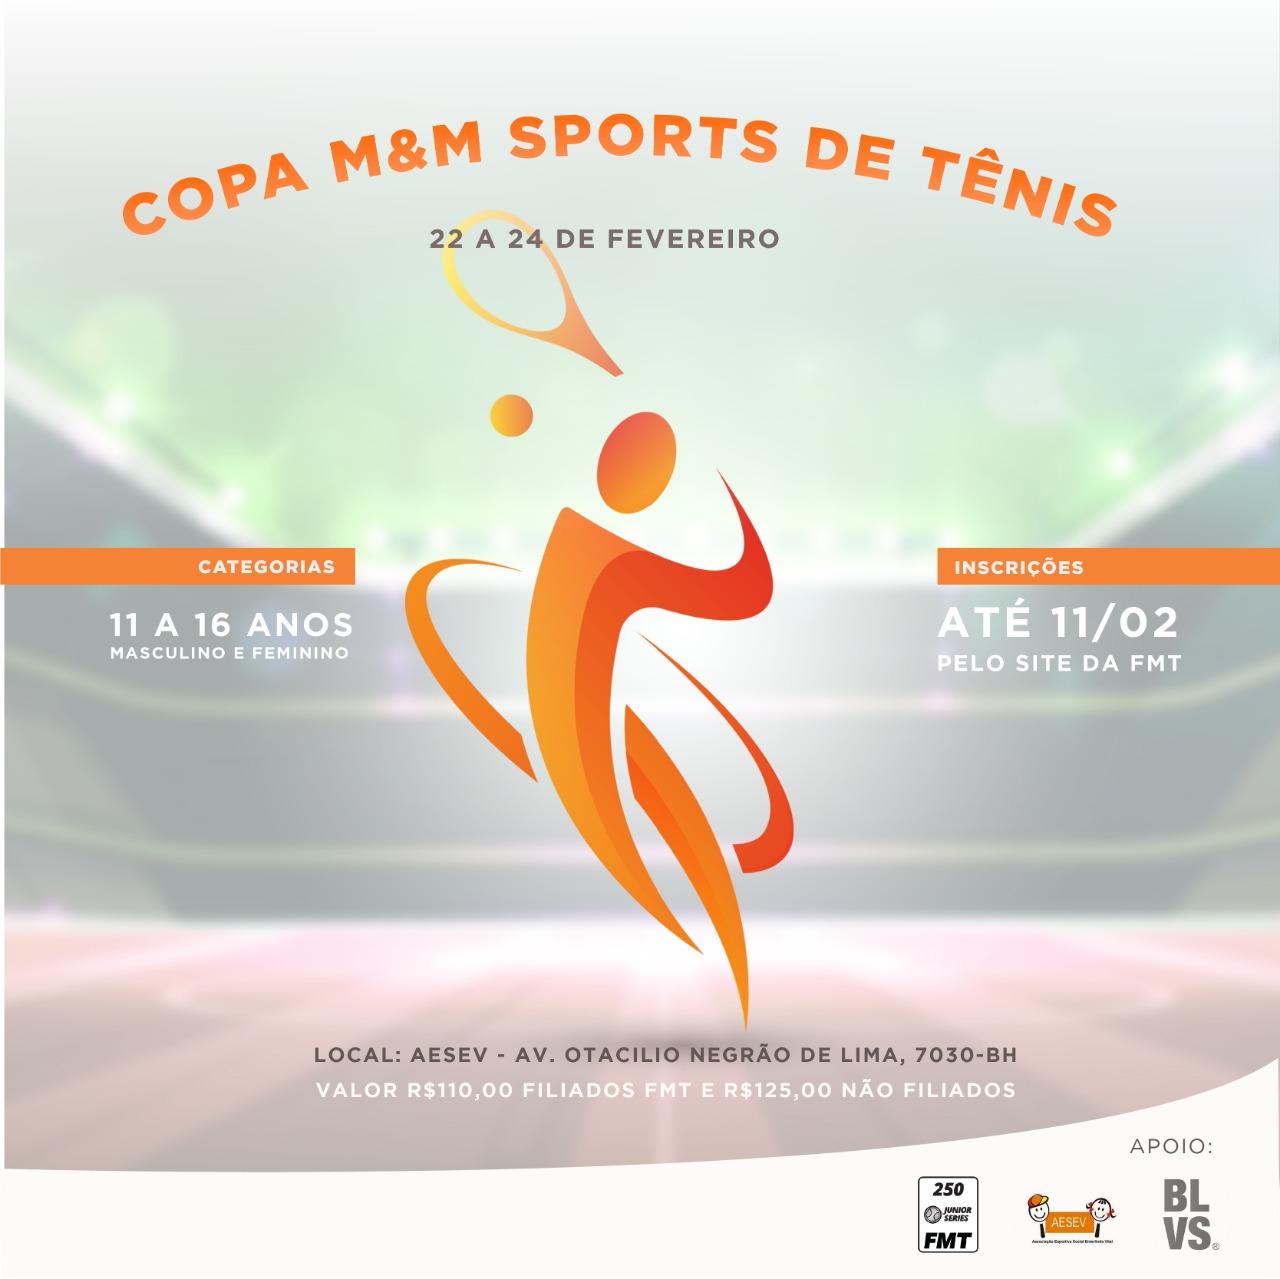 Copa M&M Sports de Tênis 2019